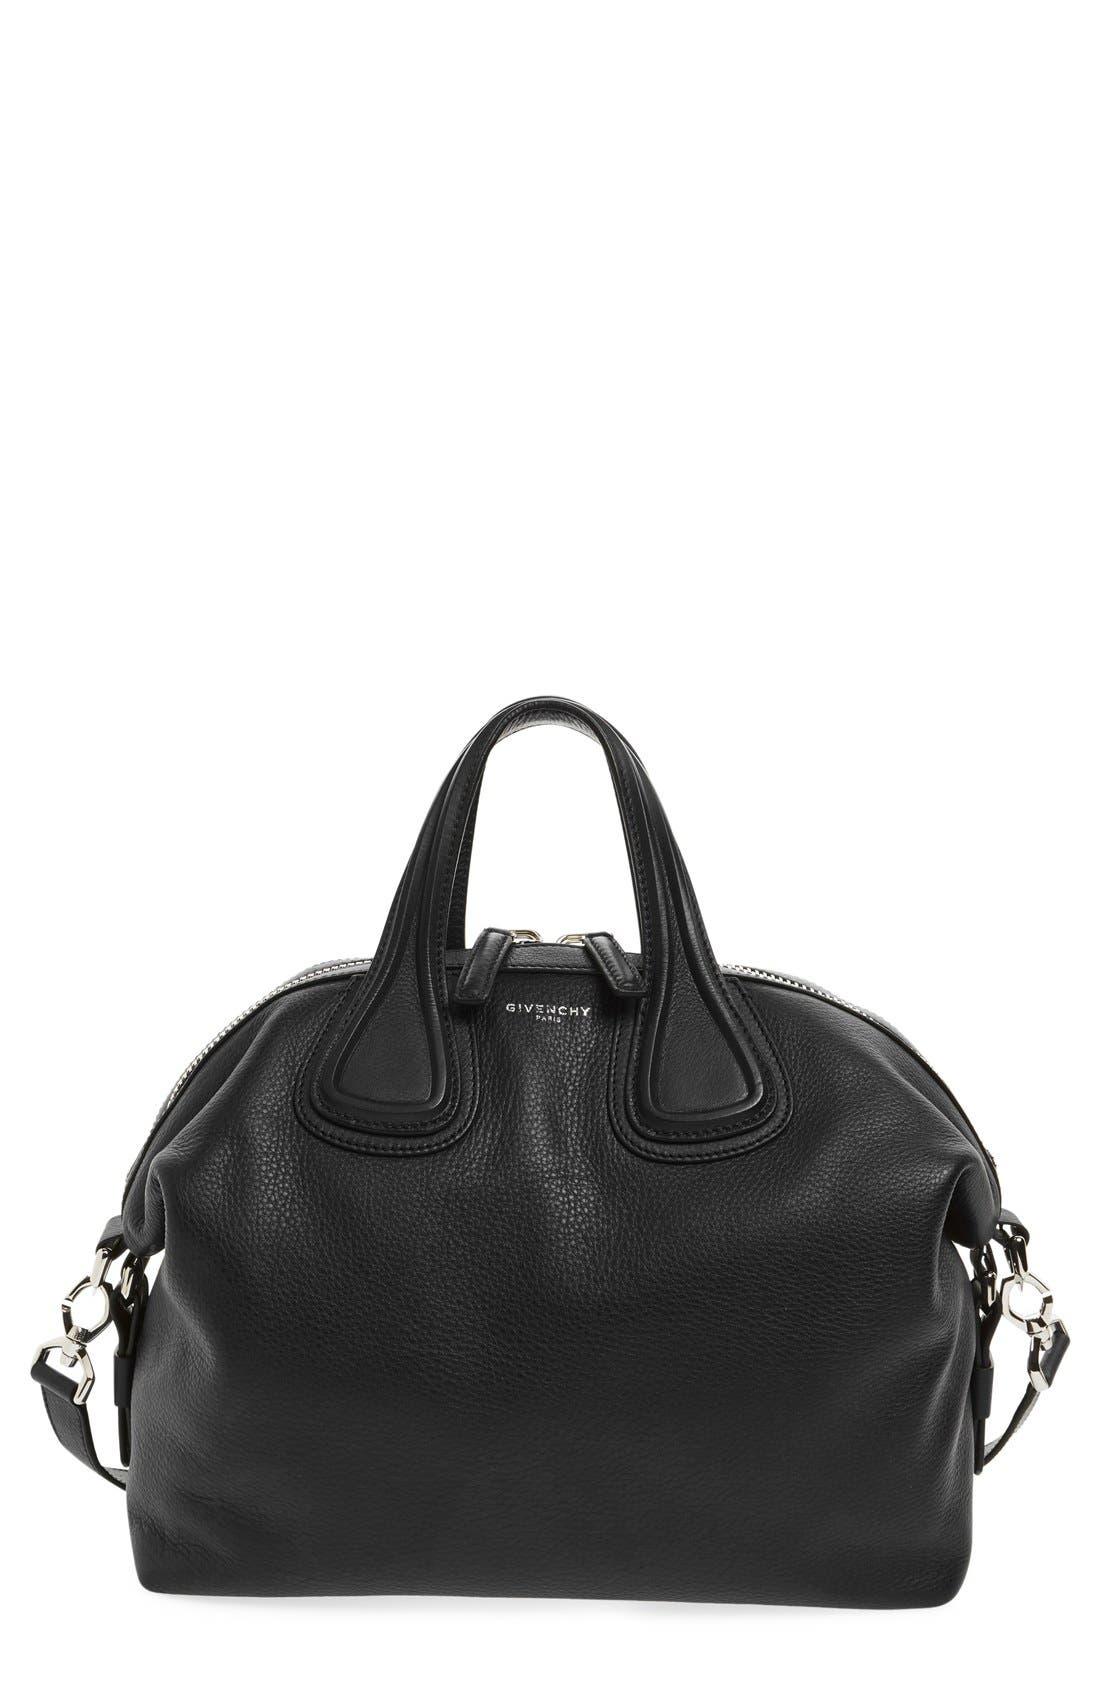 GIVENCHY Medium Nightingale Calfskin Leather Satchel